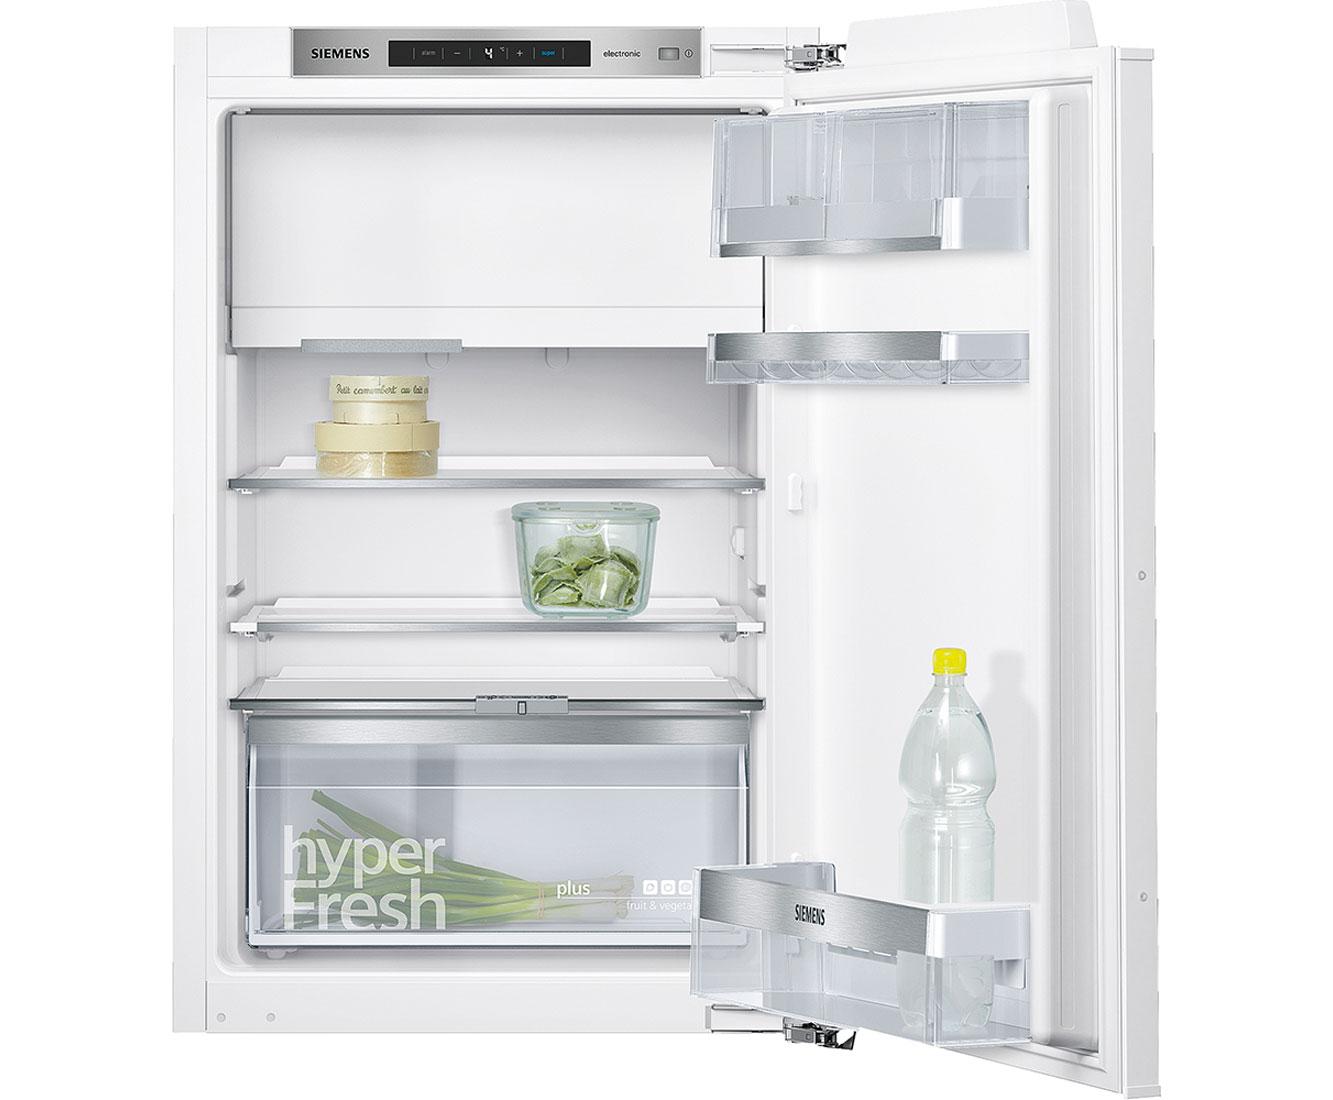 Siemens KI22LAD40 Kühlschränke - Weiss